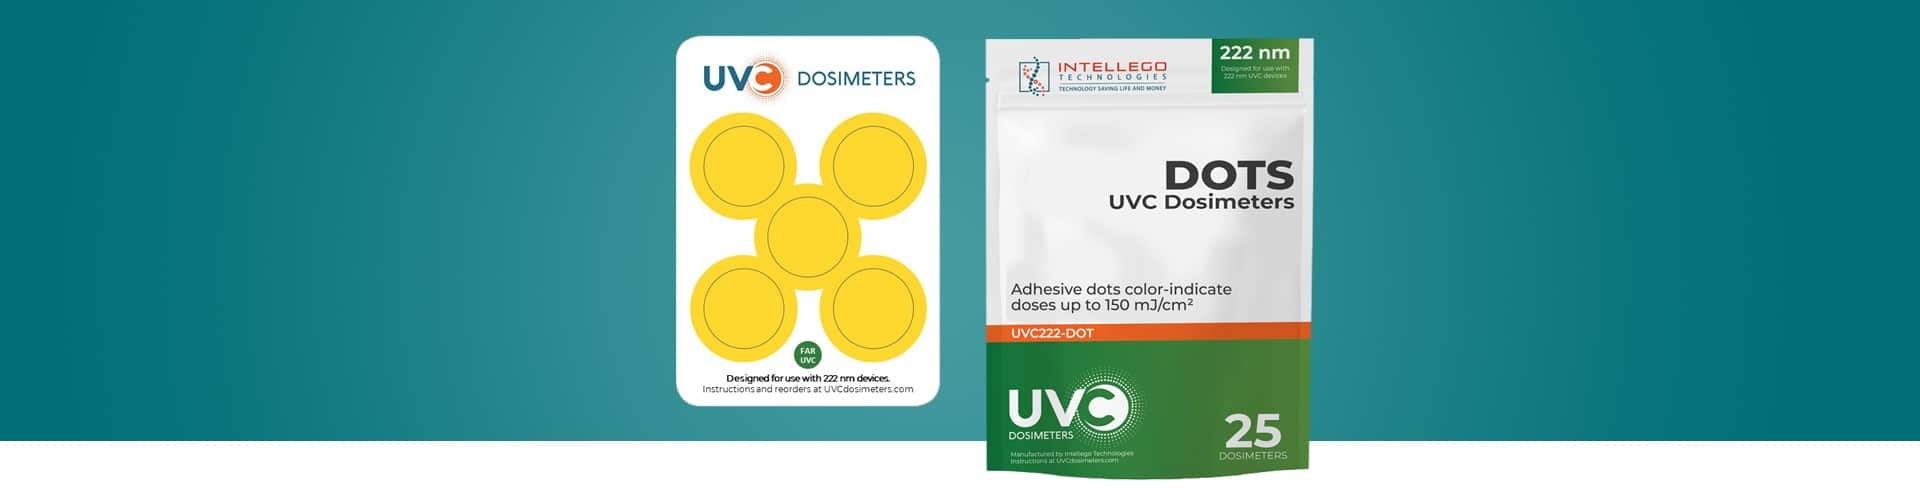 UVC 222 Product announcement